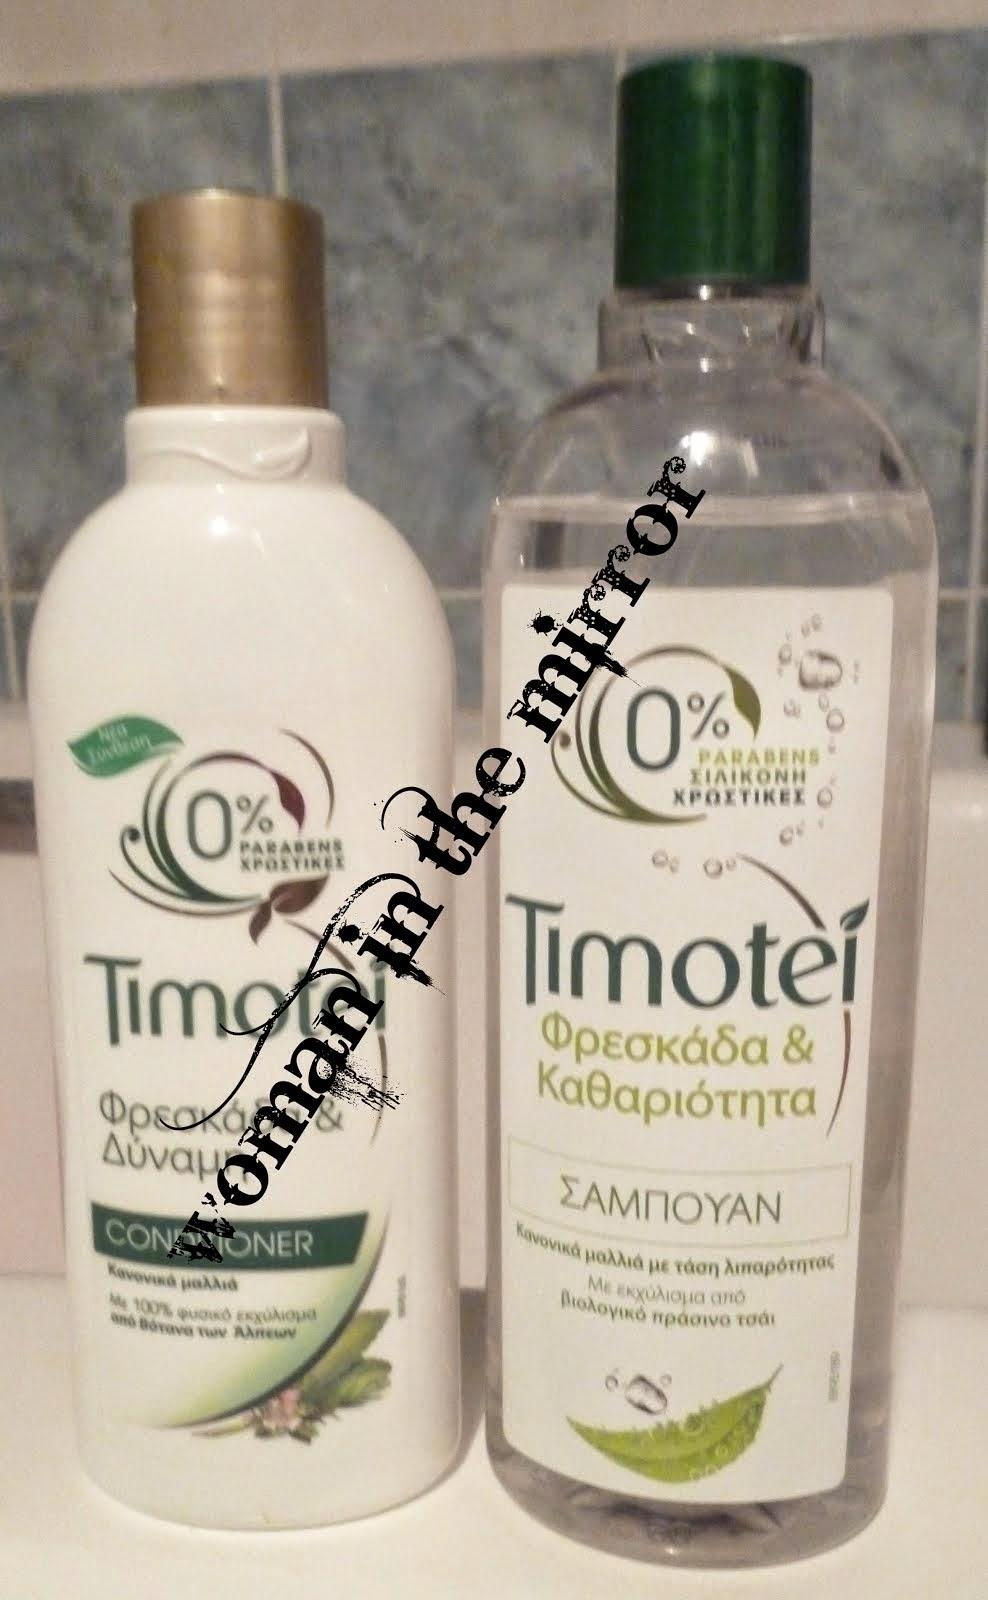 timotei - φρεσκαδα